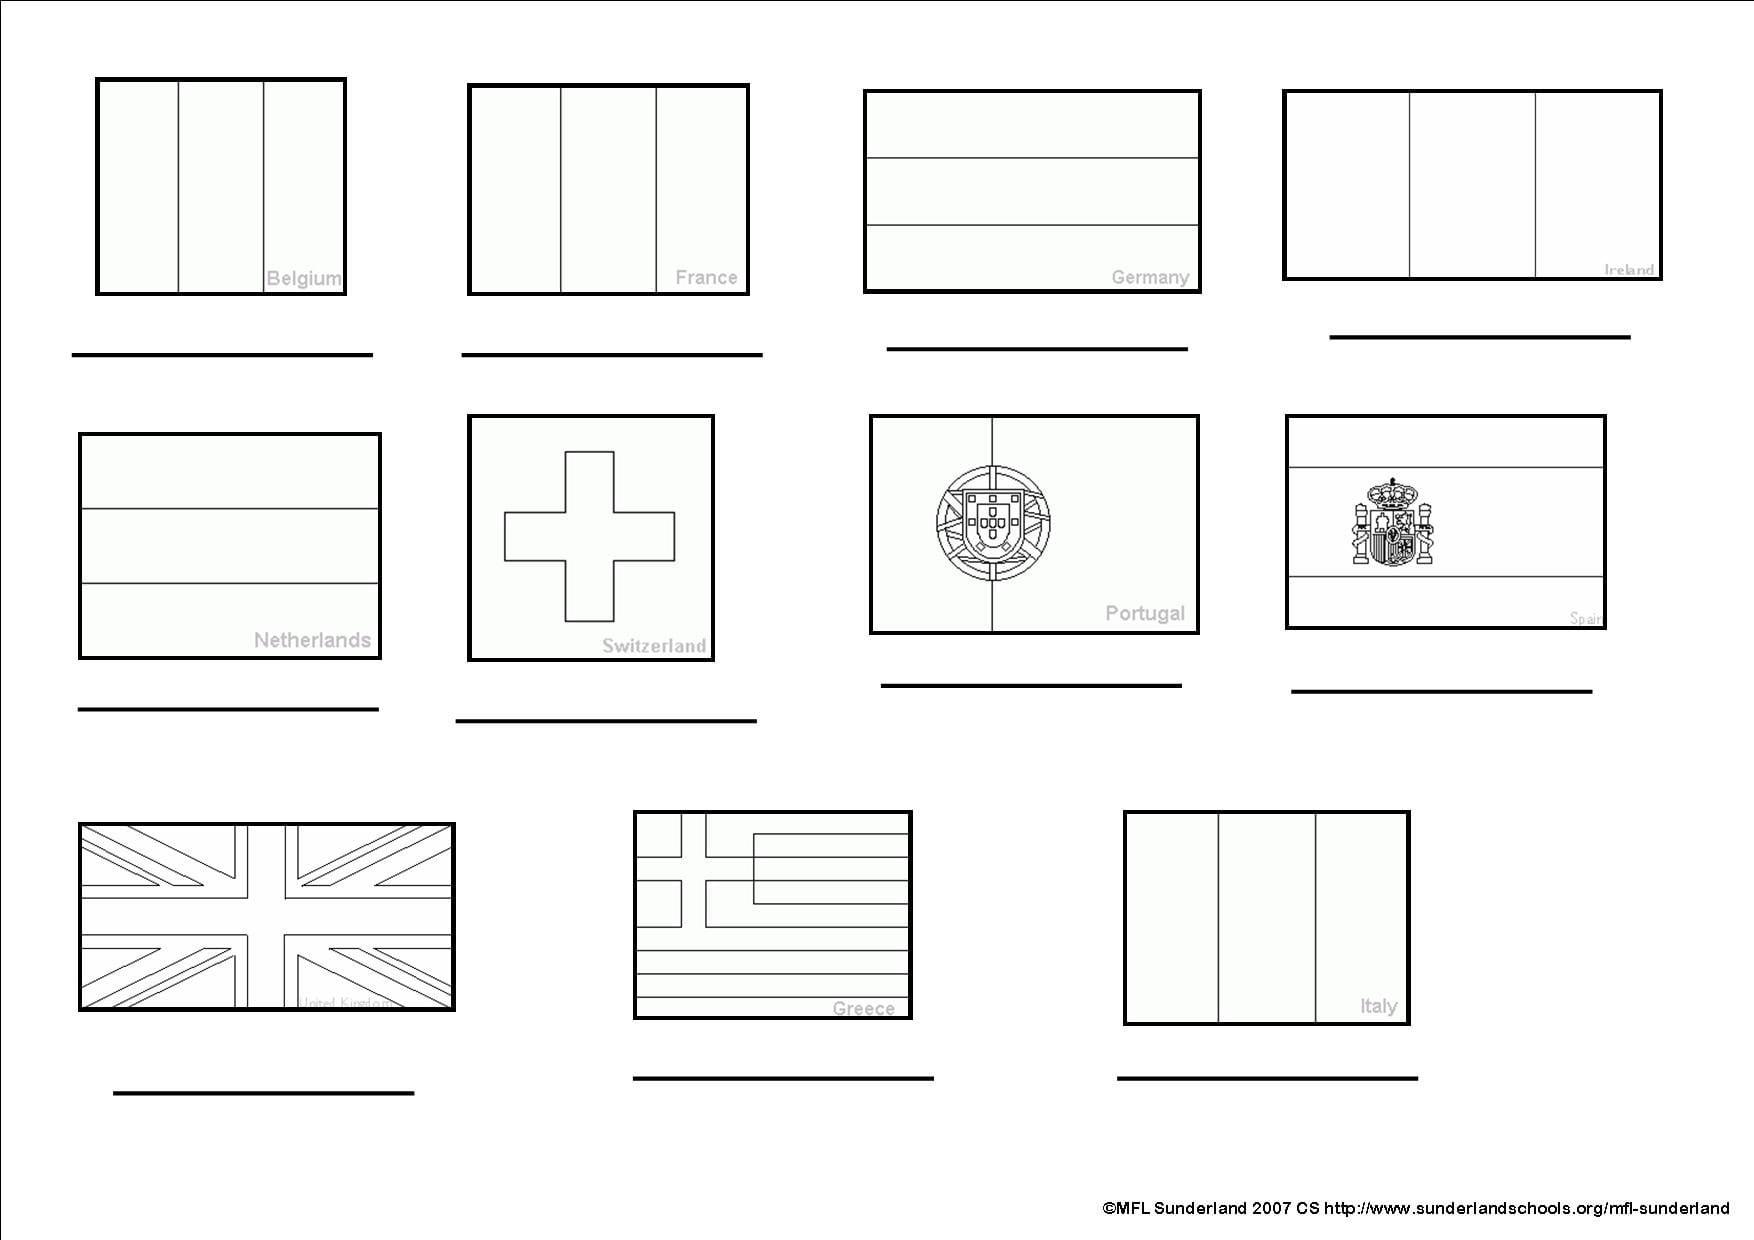 Spanish Ks3 Worksheets Within Telling Time In Spanish Worksheets Pdf